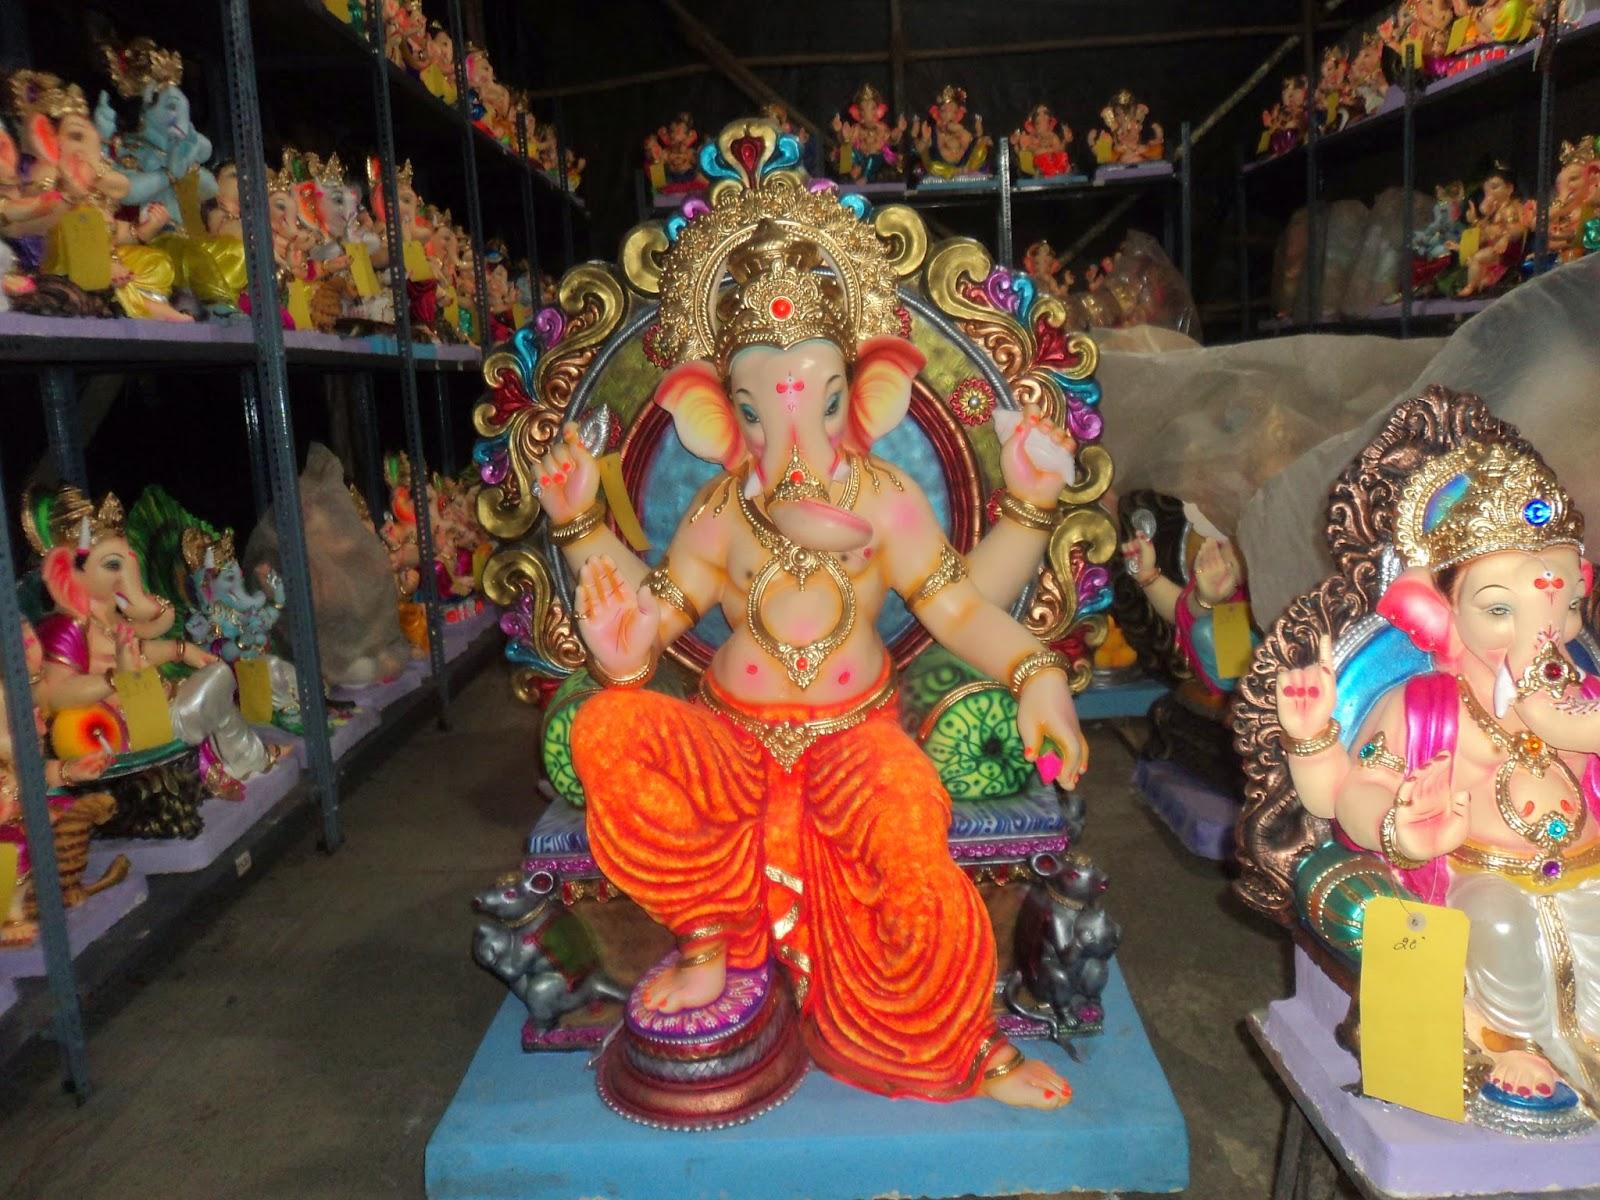 essay on ganpati utsav Speech/ essay on ganesh chaturthi in english dilip thakur ganesh festival, ganesh utsav, essay on ganesh chaturthi, ganesh idol, ganesh murti.